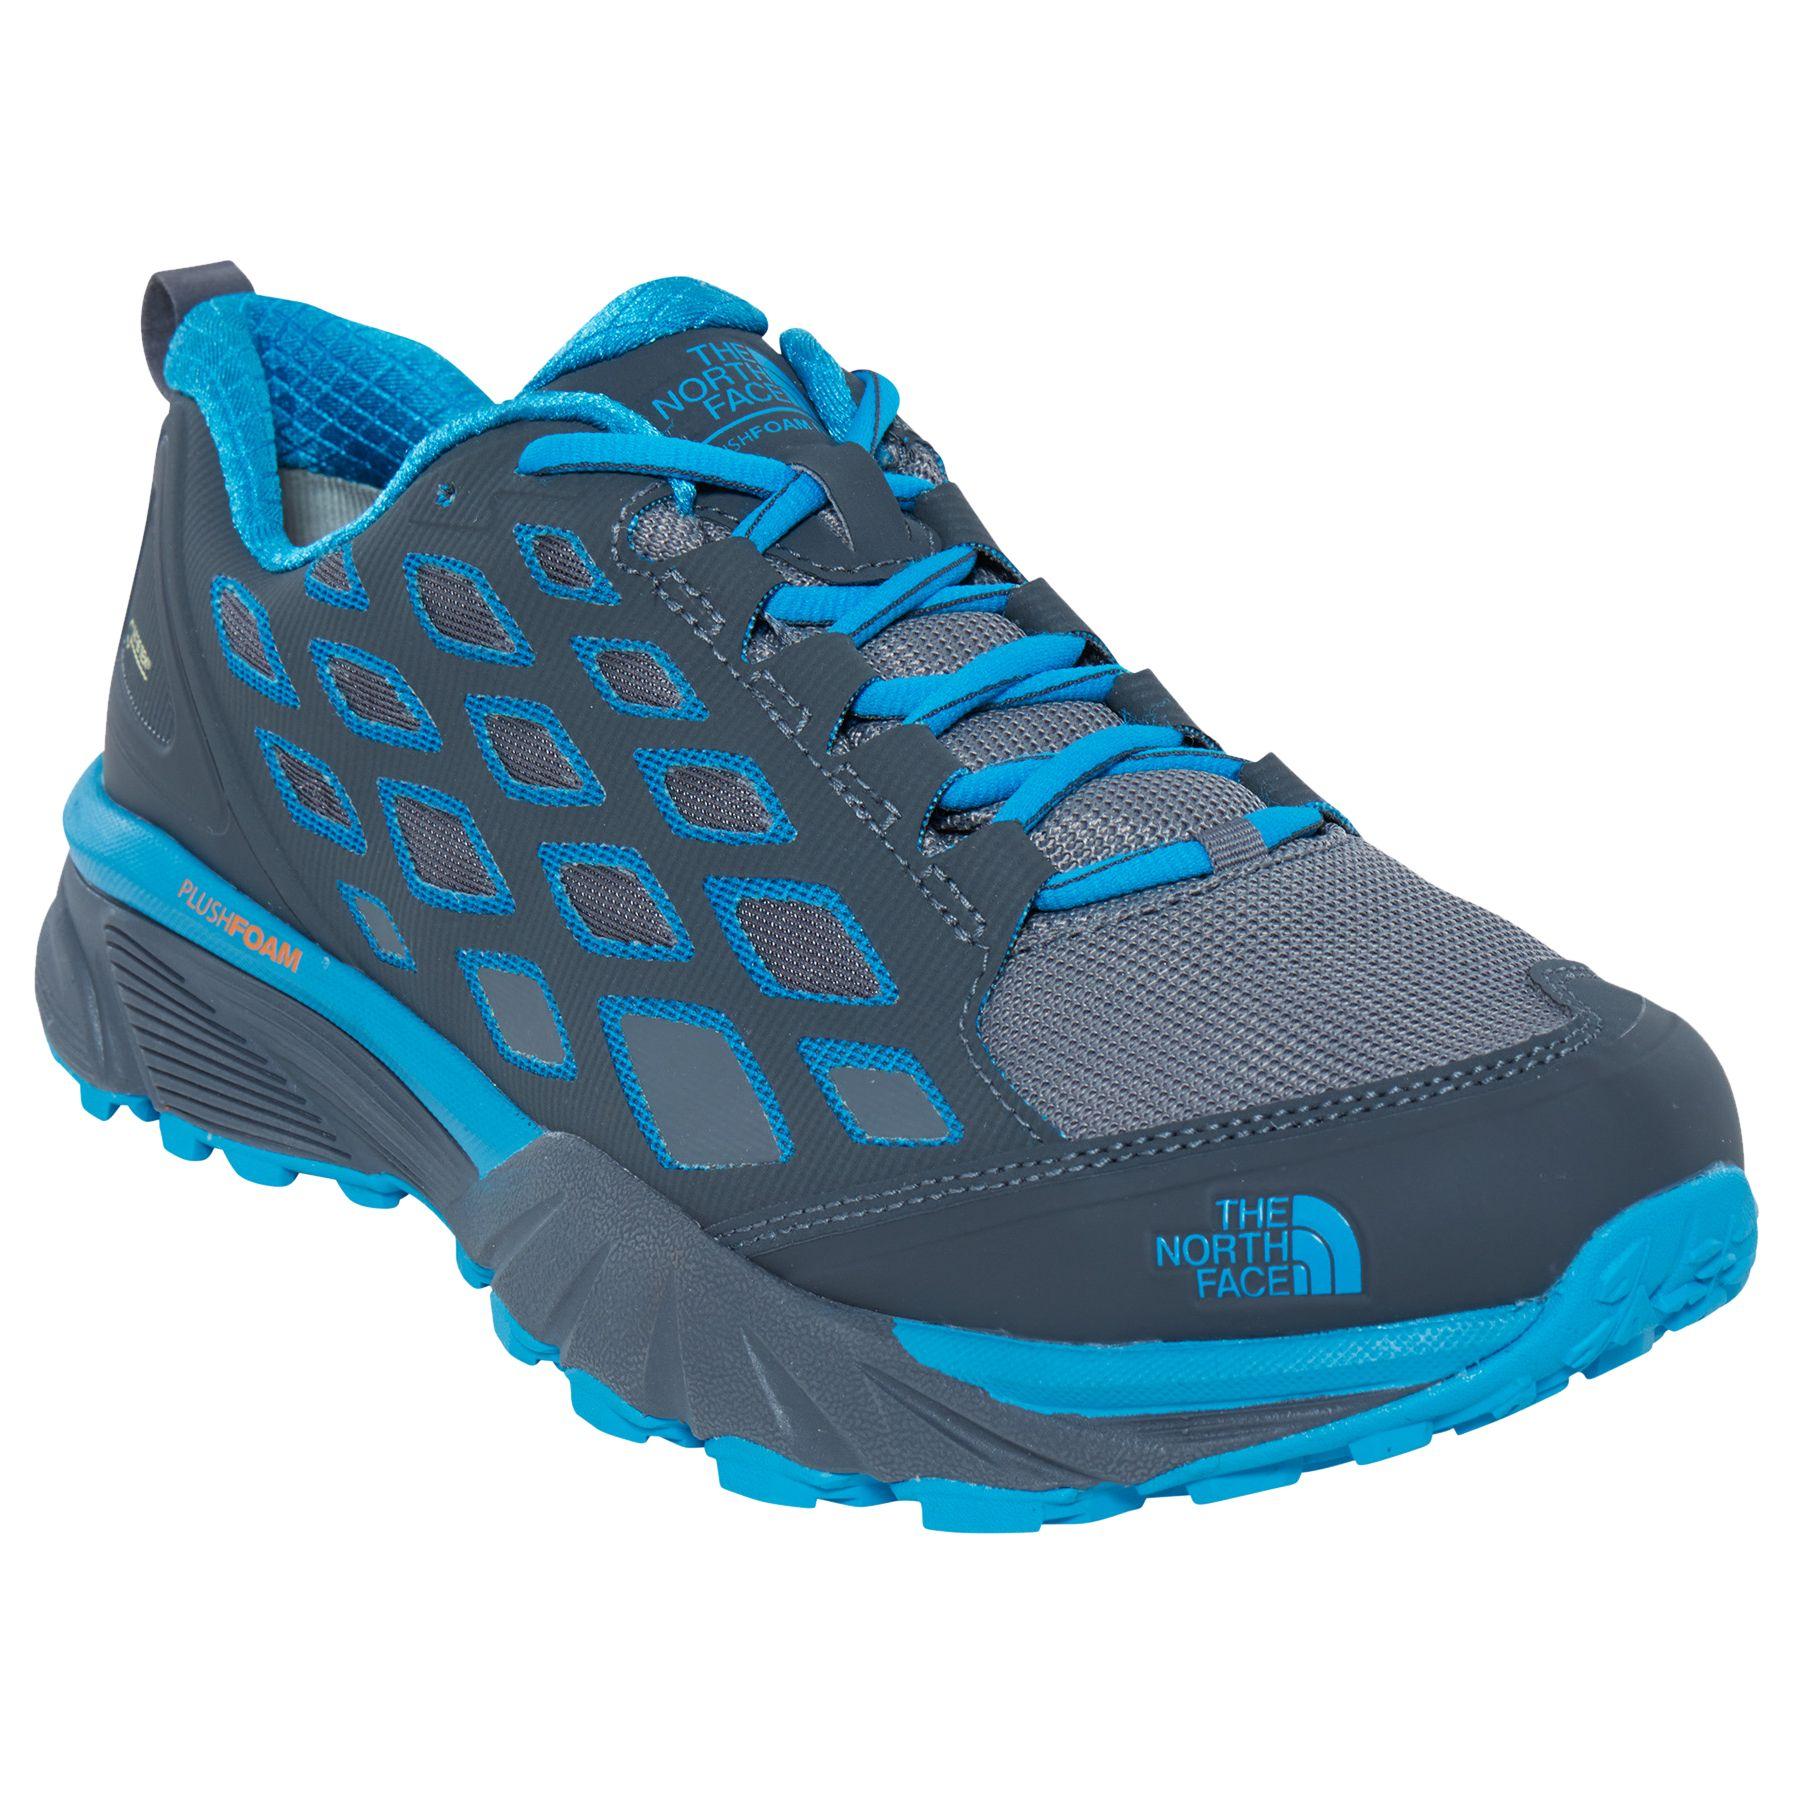 b5ba2f82648 The North Face Endurus Hike GTX Waterproof Men's Walking Shoes, Grey ...